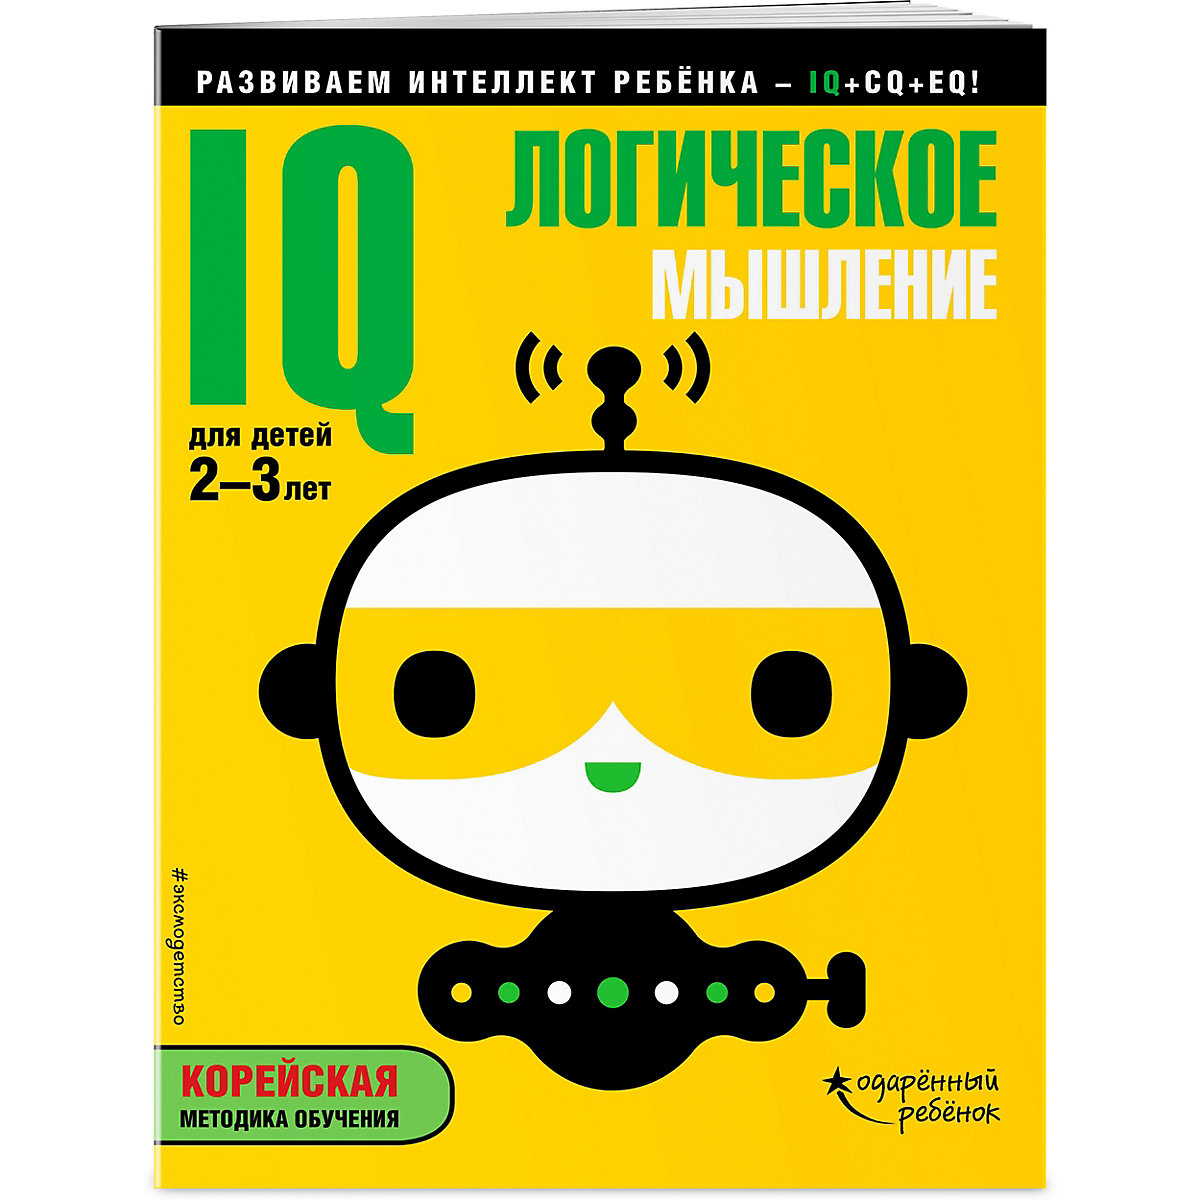 Books EKSMO 9556131 Children Education Encyclopedia Alphabet Dictionary Book For Baby MTpromo